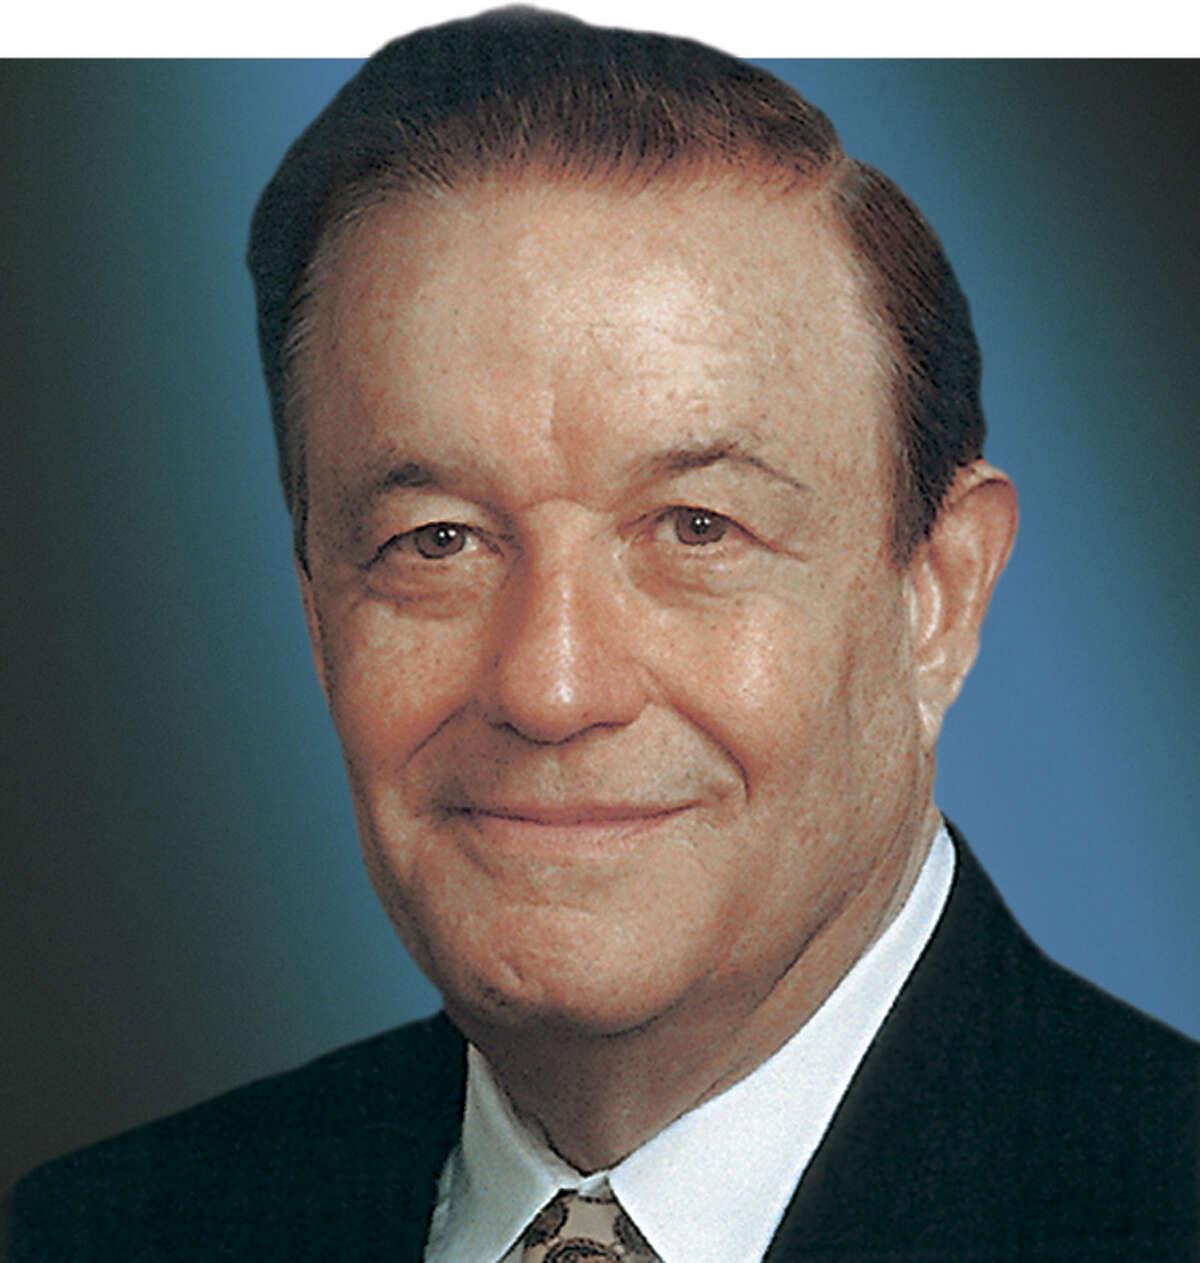 Robert Lee Moody Sr., chairman of American National Insurance Co. 2014 base pay: $2 million